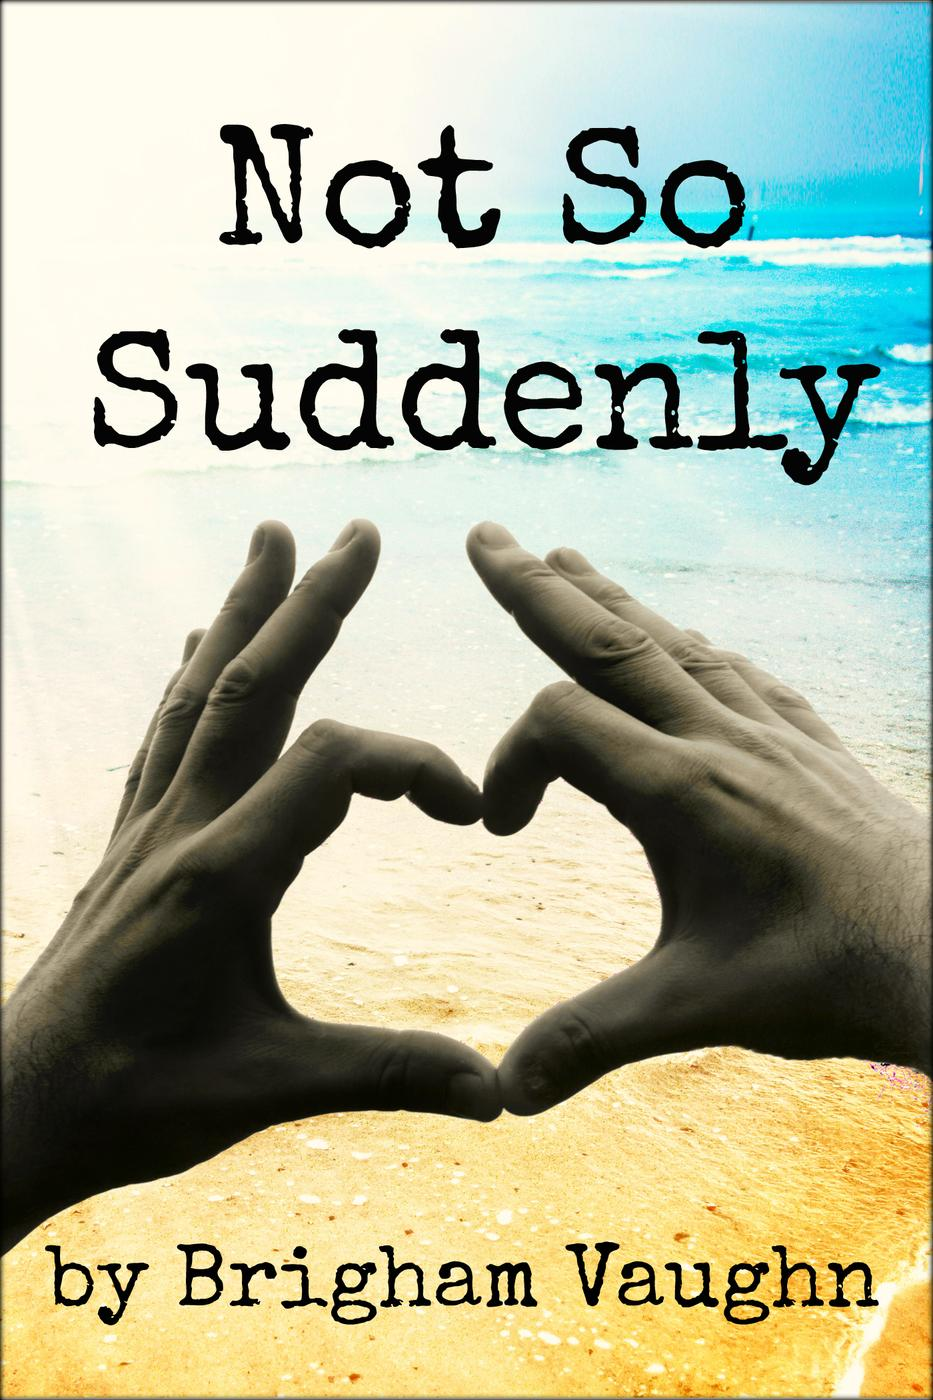 Not So Suddenly Cover - Brigham Vaughn